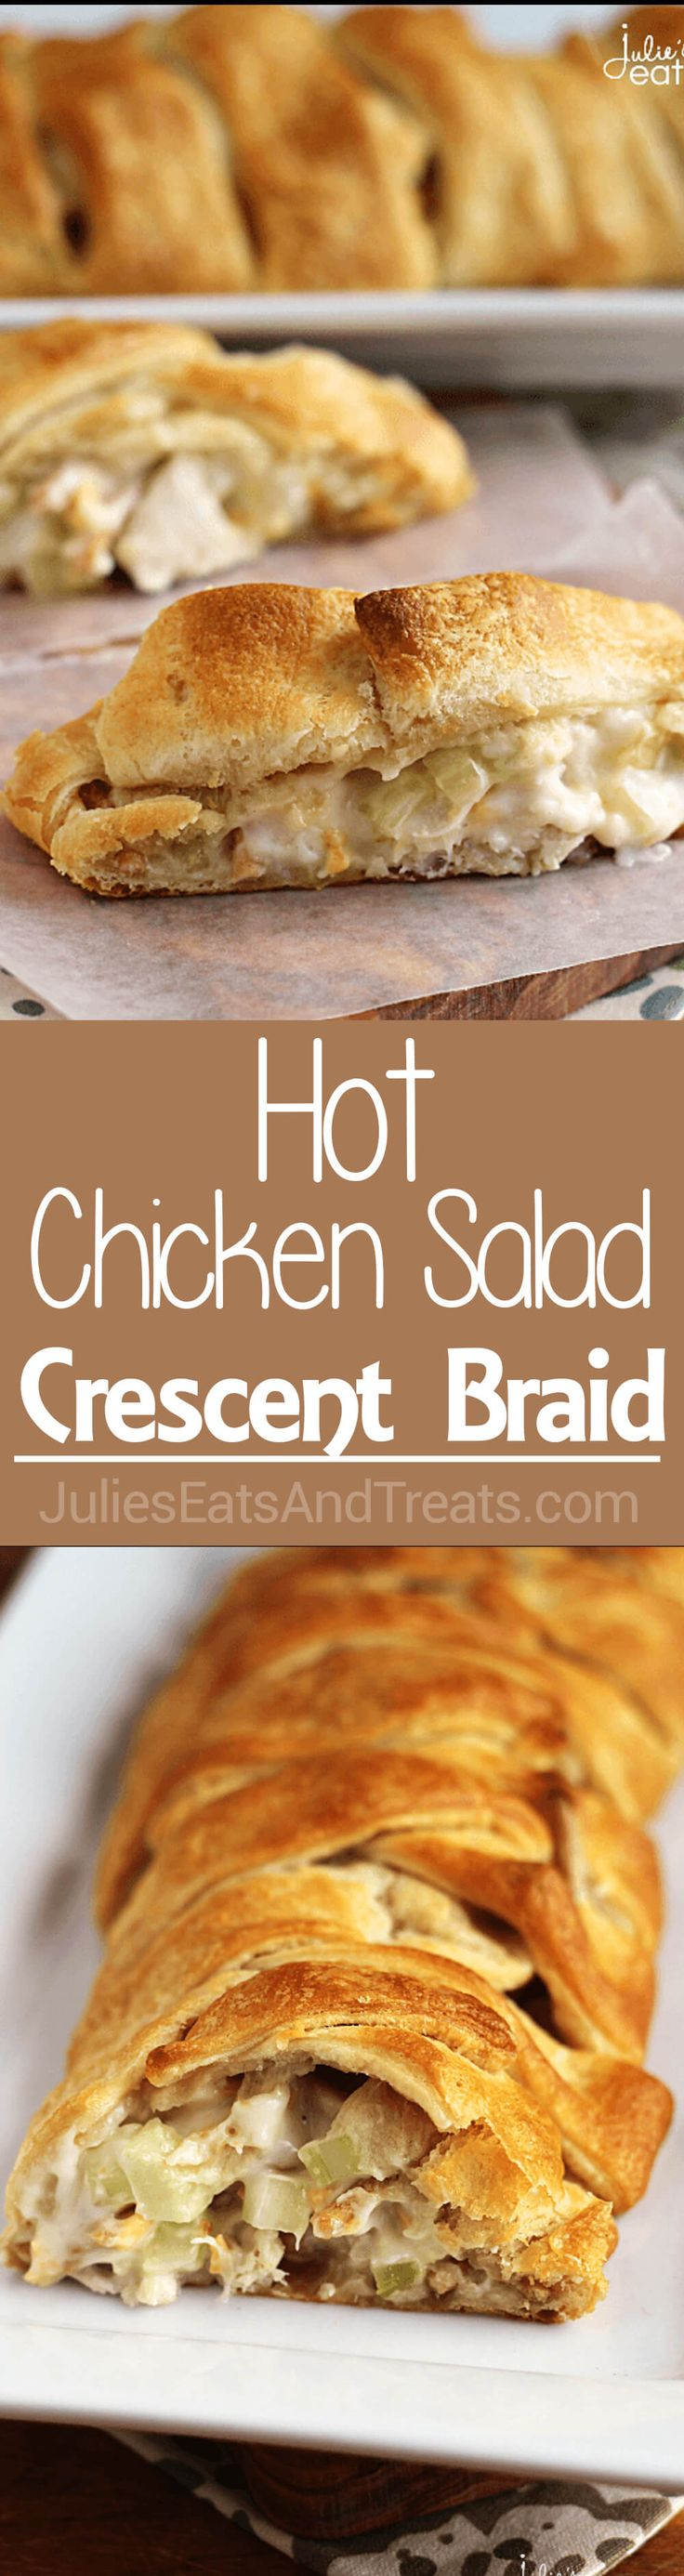 Hot Chicken Salad Crescent Braid ~ Flaky Crescent Rolls Stuffed with Chicken…